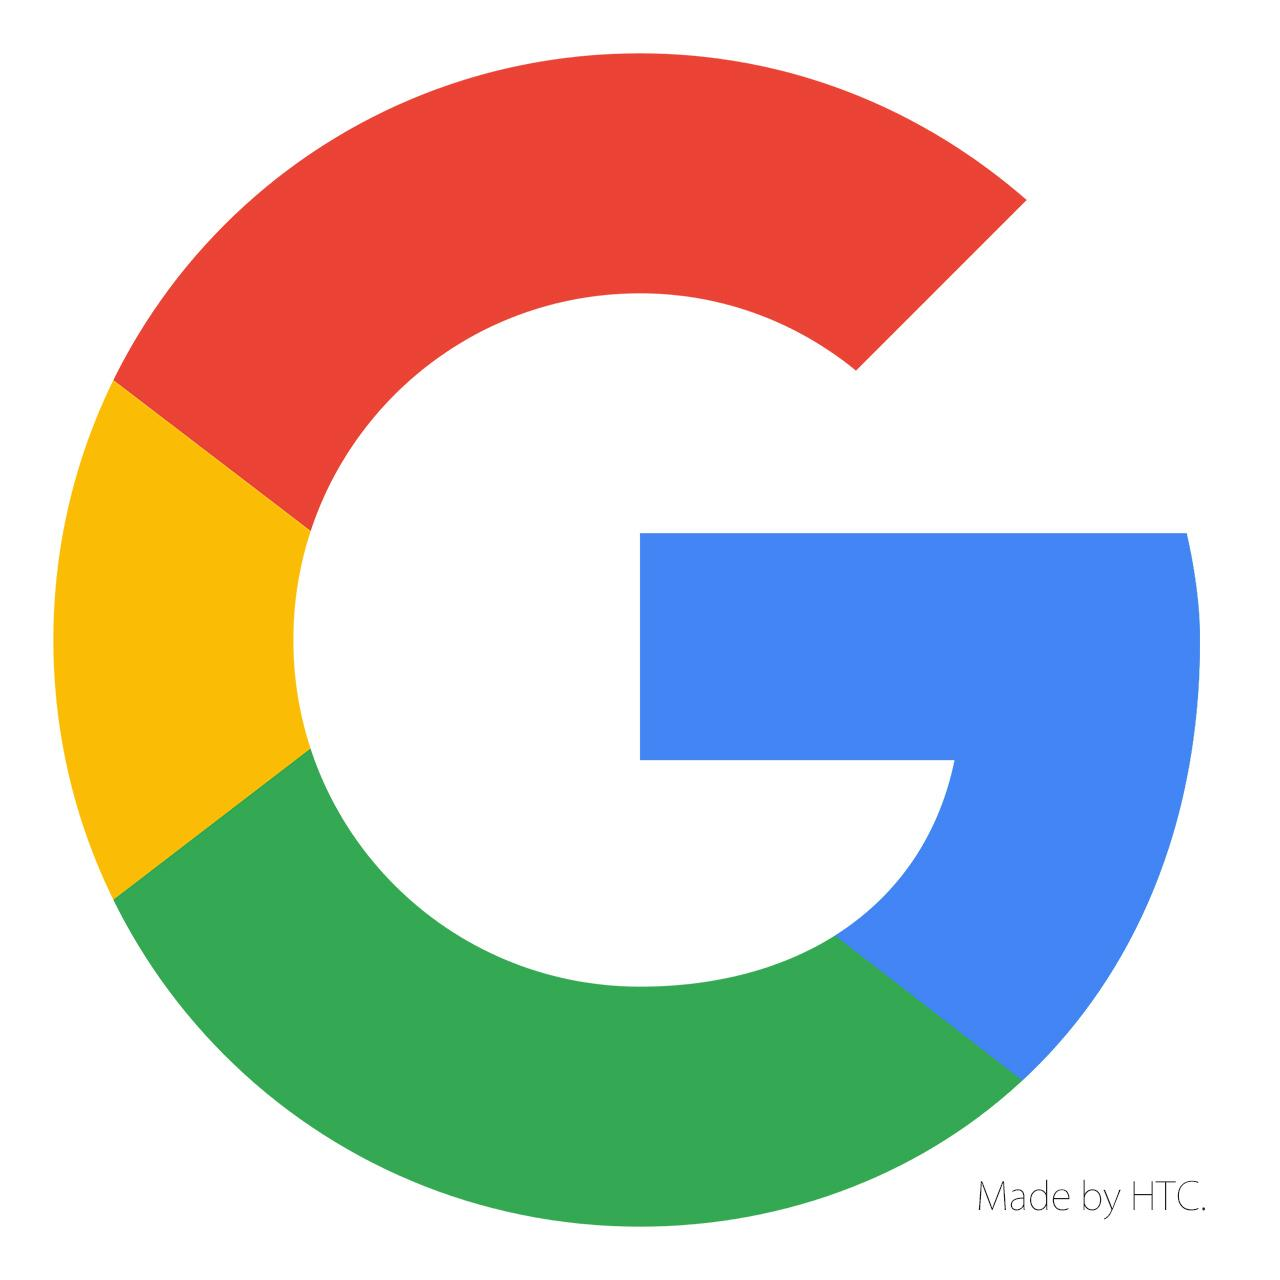 htc_google_pixel-1